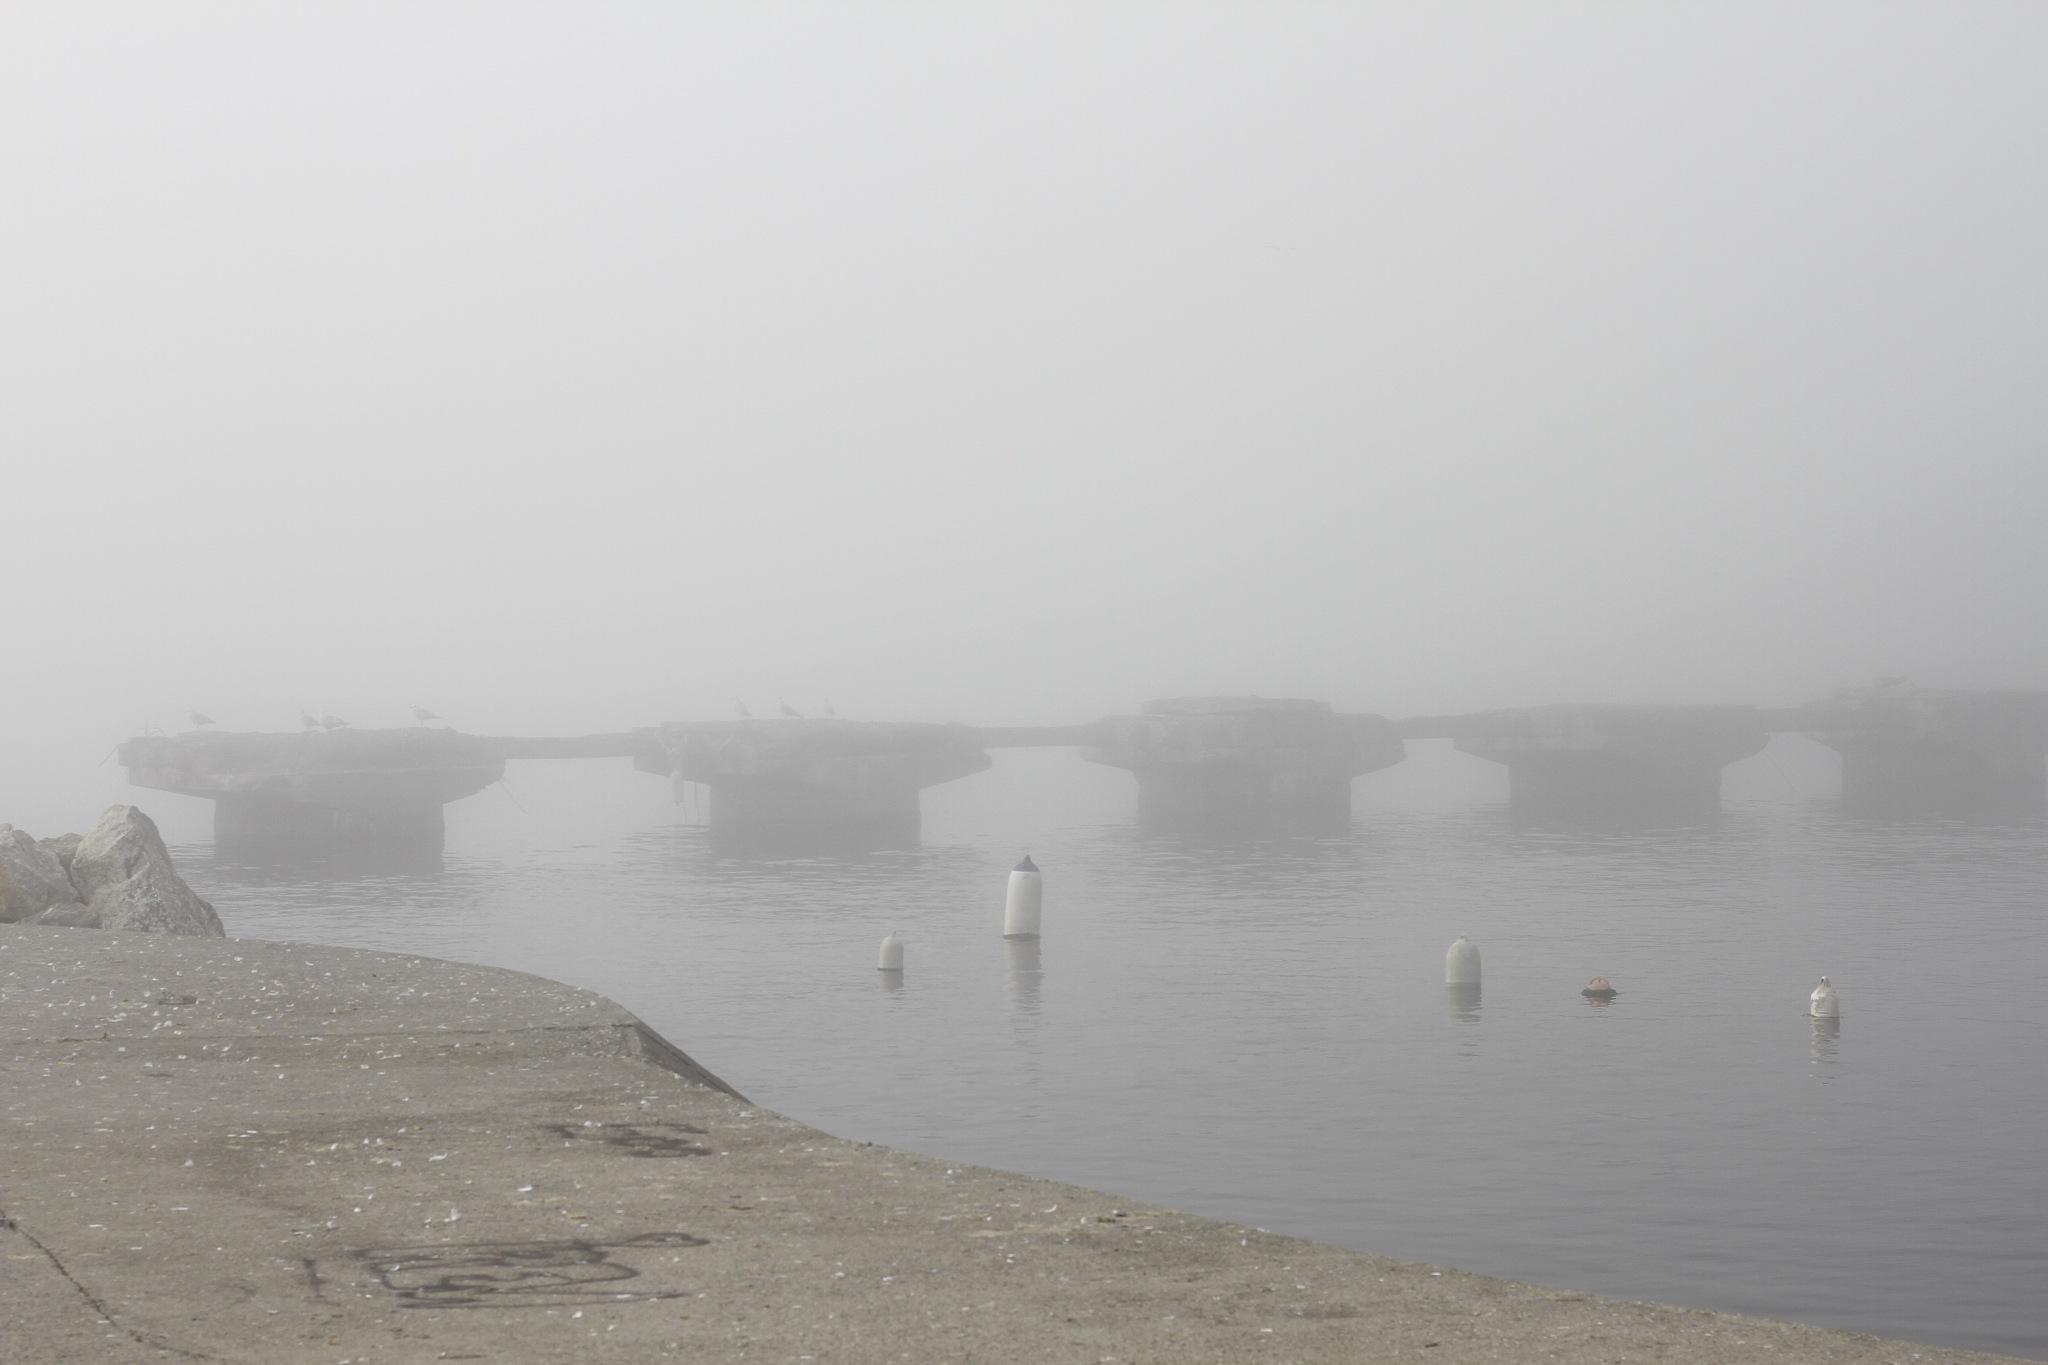 Misty by Emrah Serdaroglu